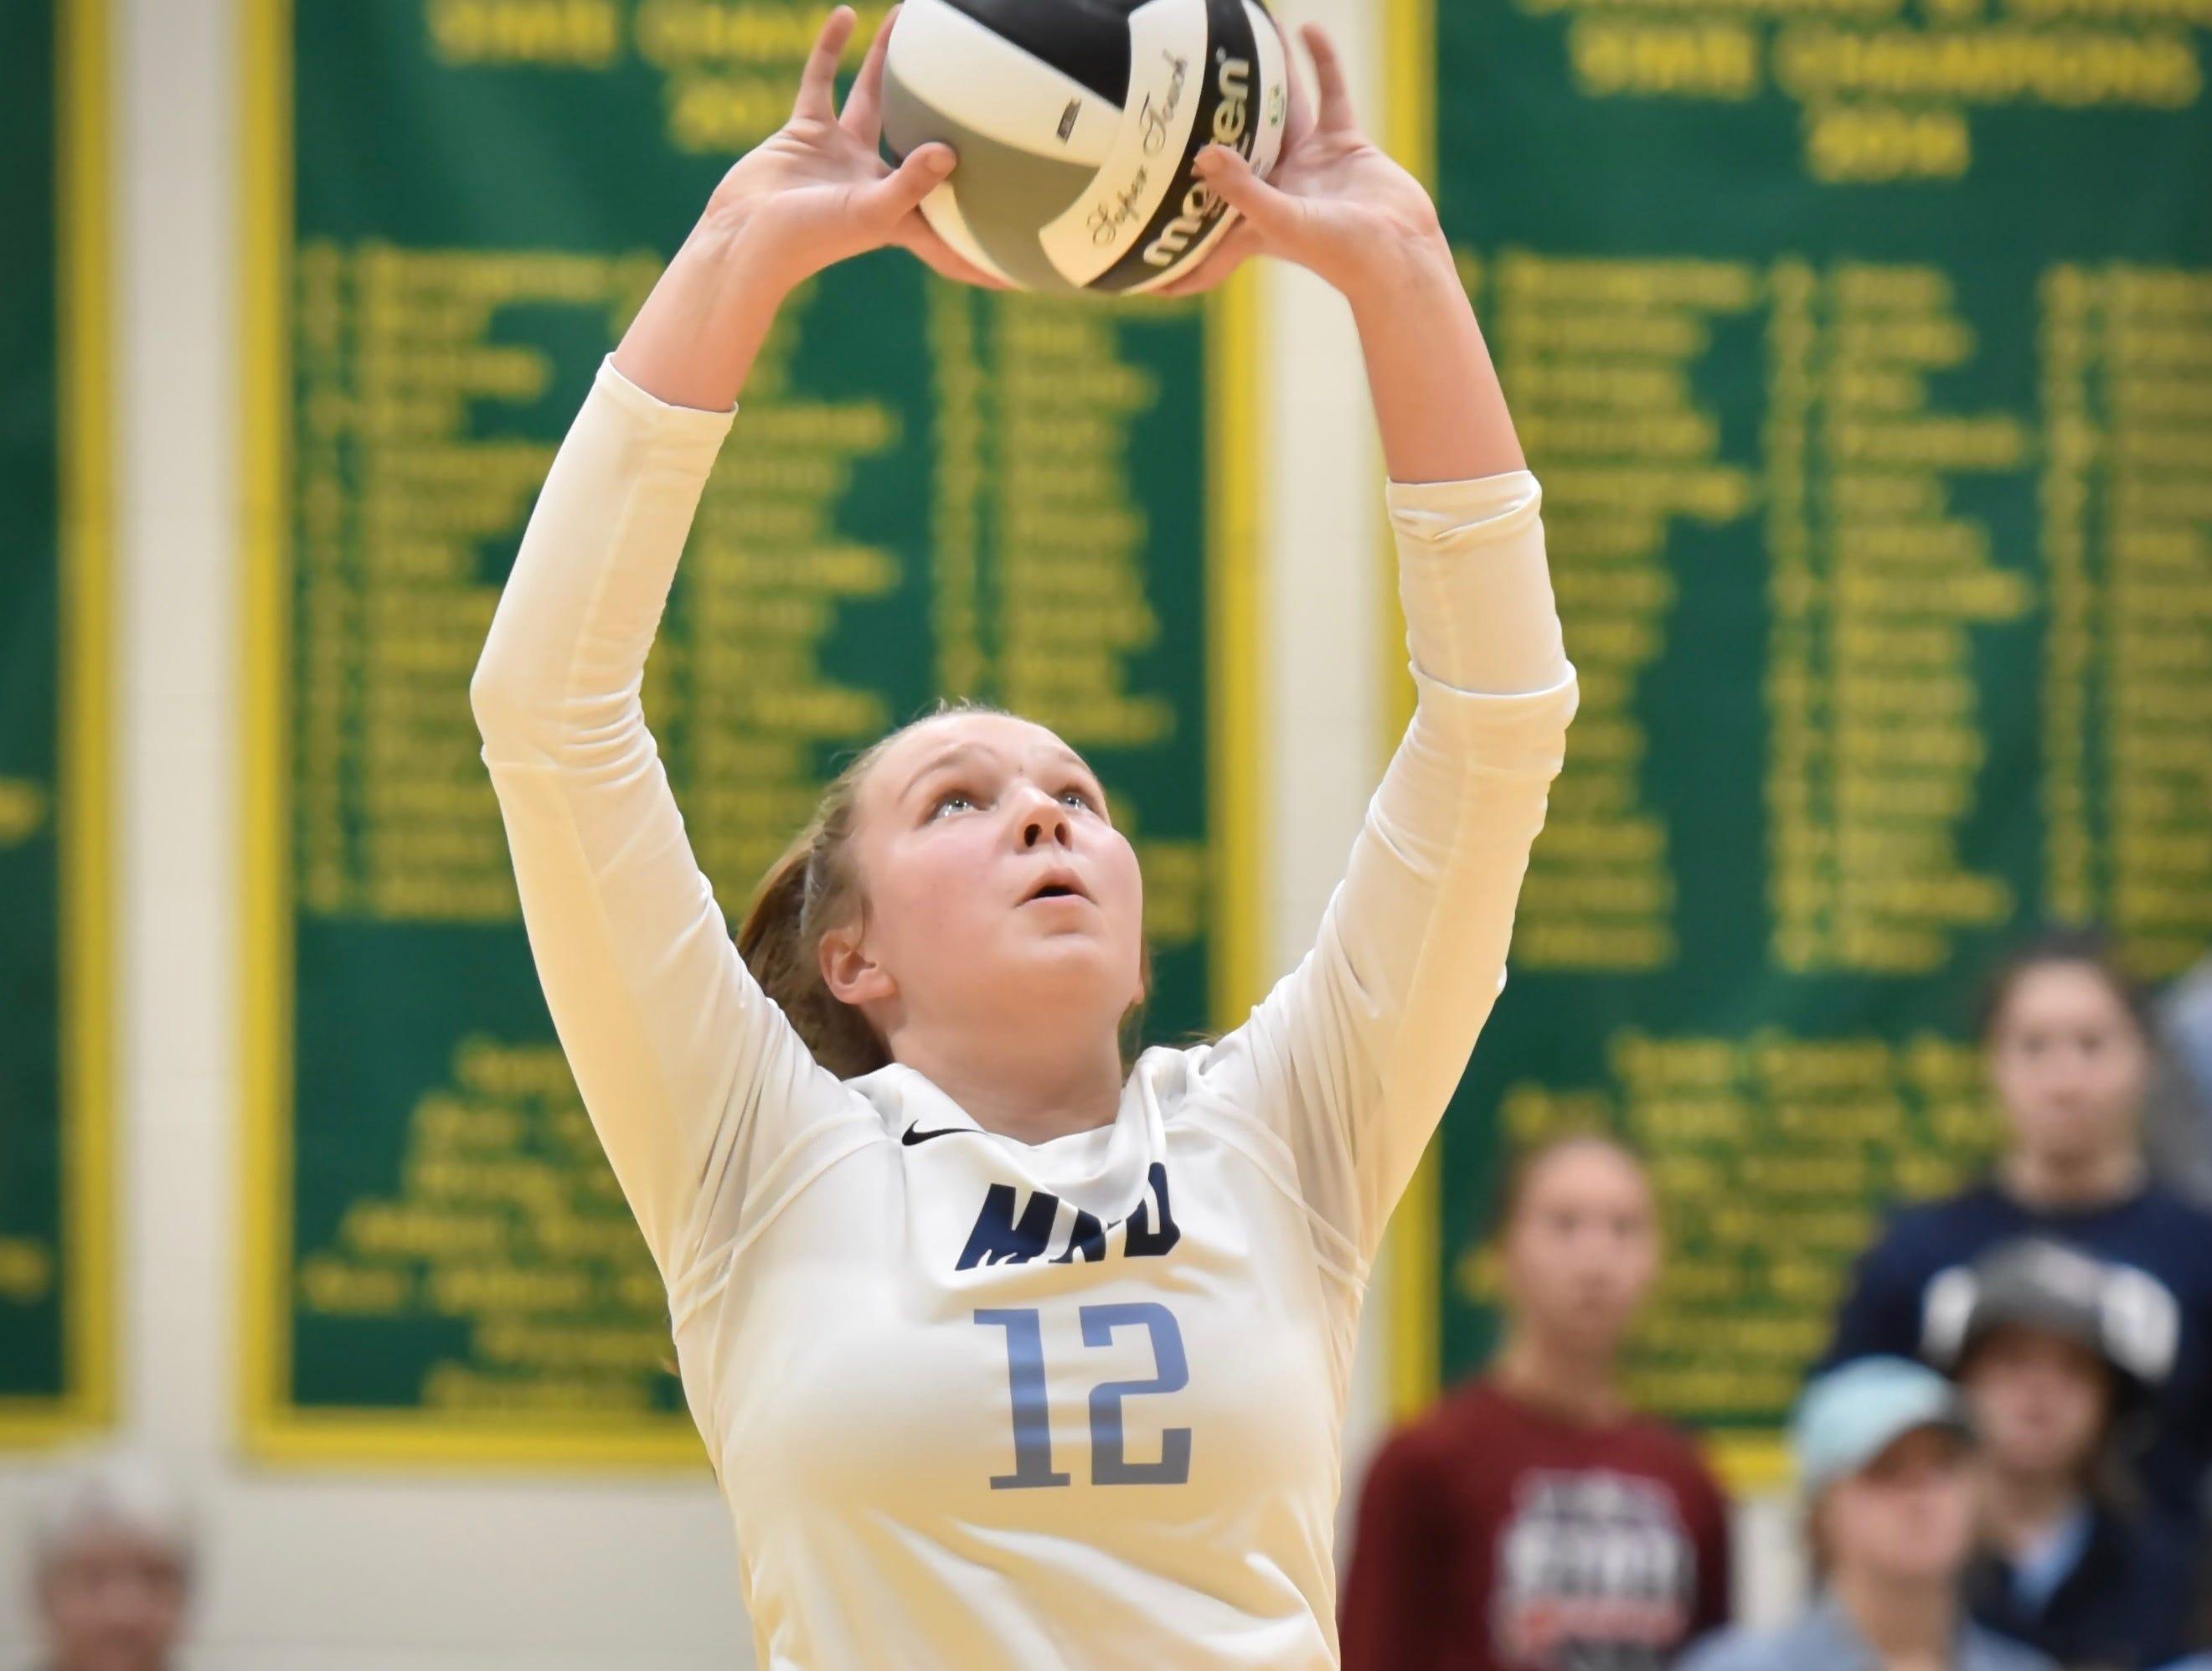 MND's Megan Wielonski sets a teammate against Ursuline Tuesday, Sept. 11, 2018 at Ursuline Academy